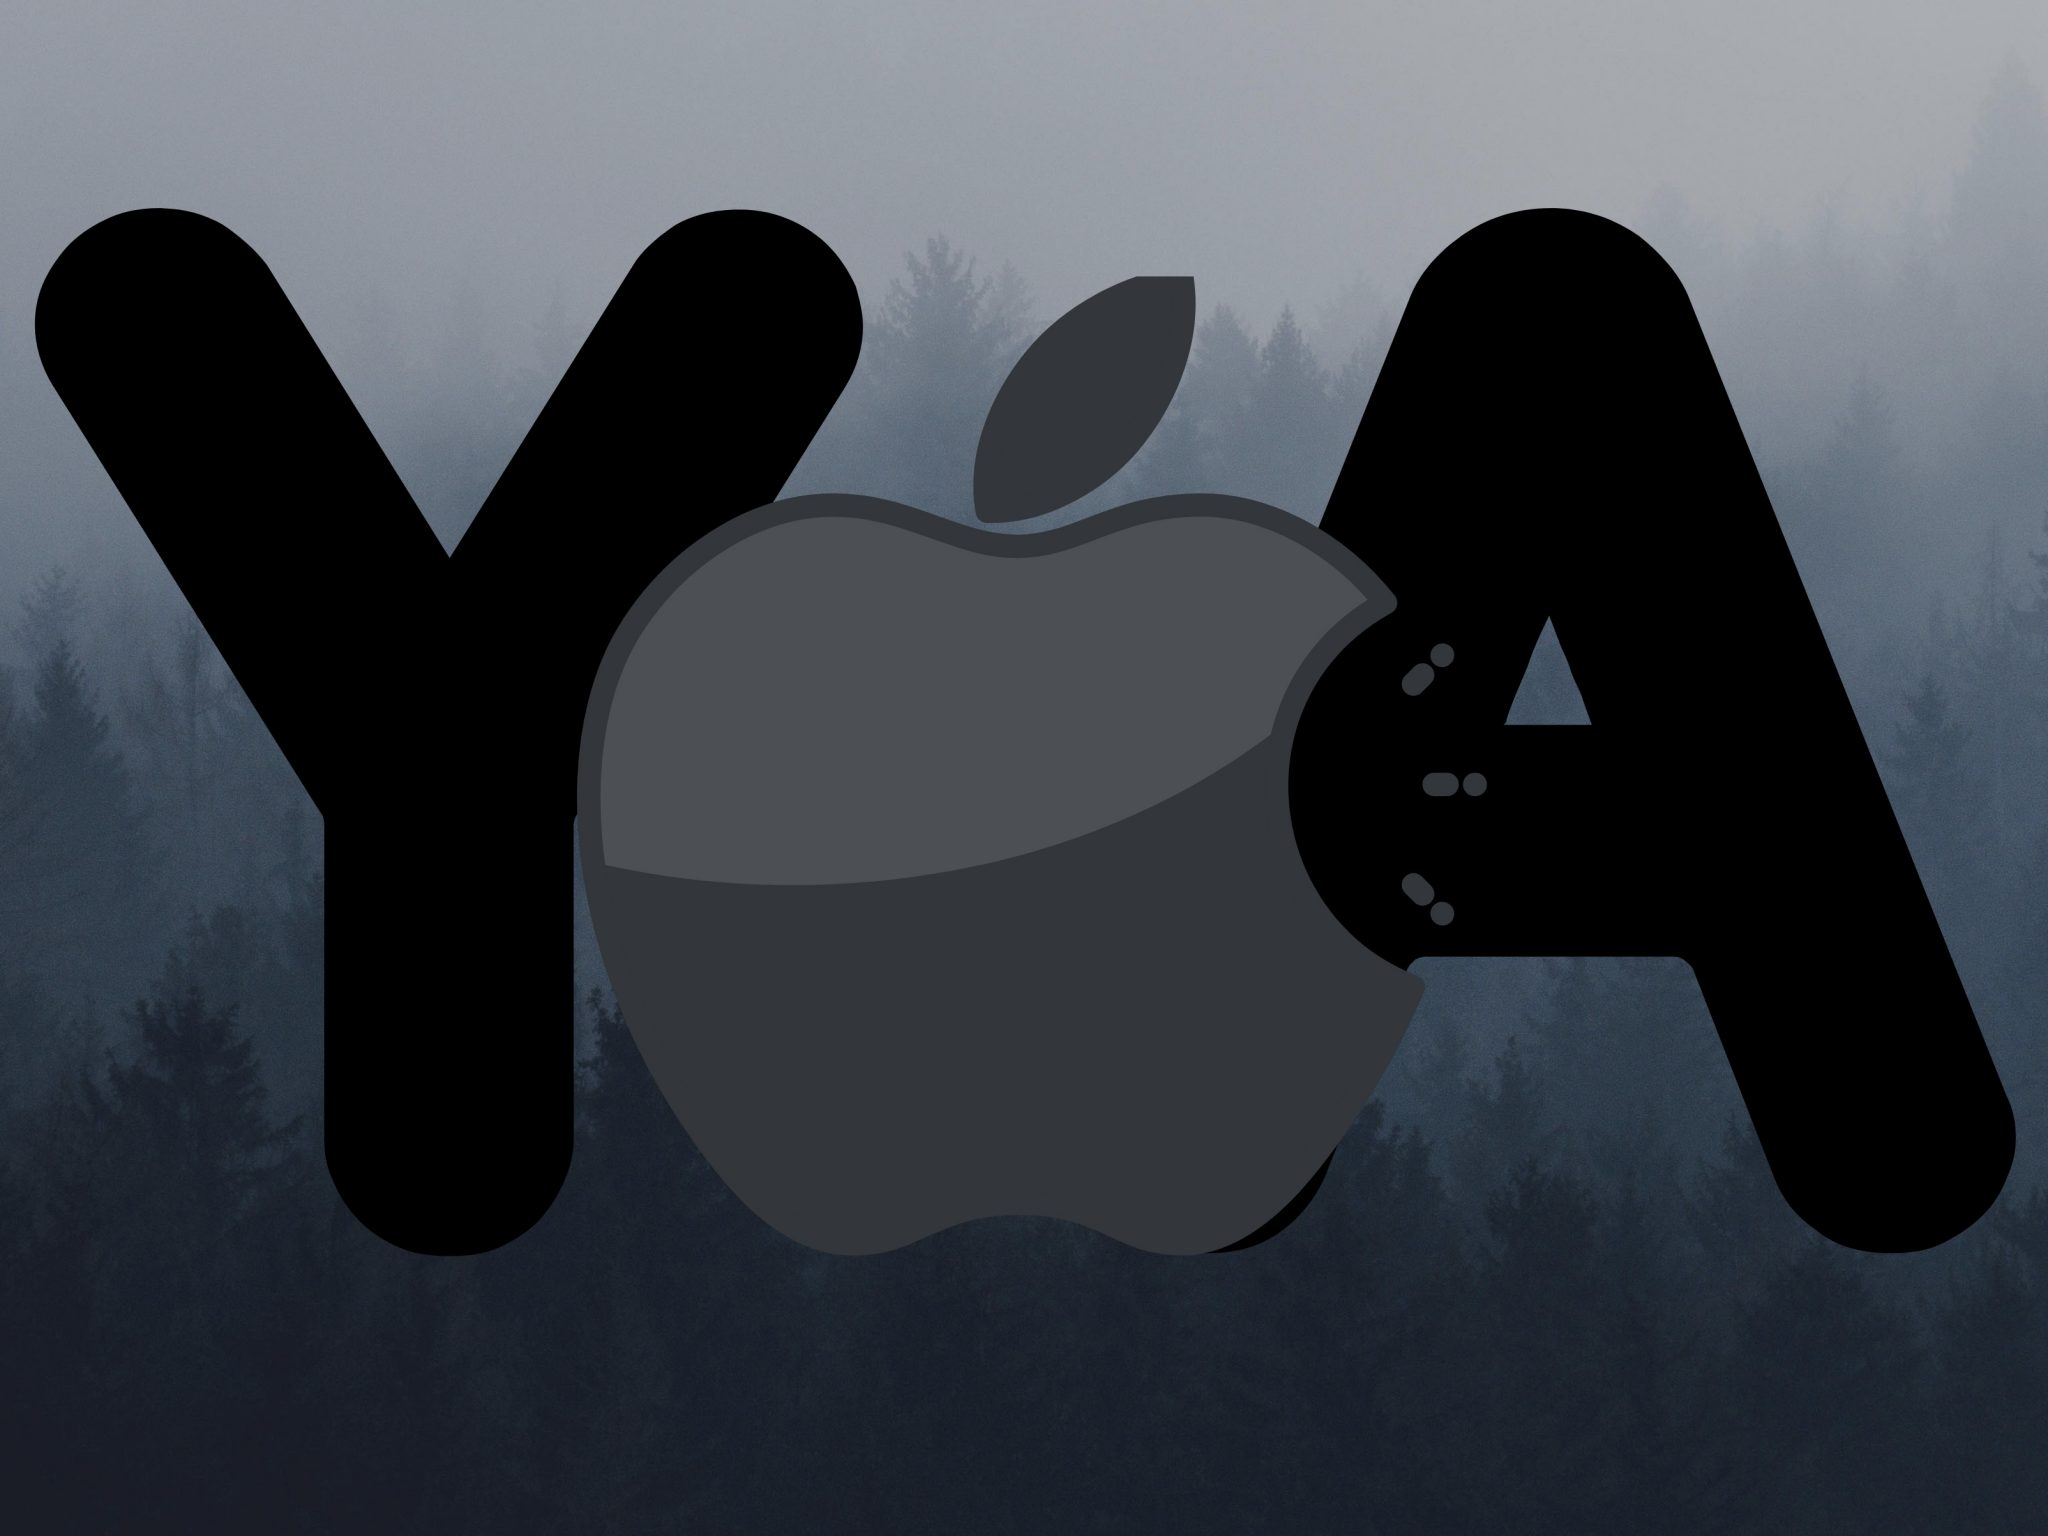 2048x1536 wallpaper Apple Logo Ya Grey Background iPad Wallpaper 2048x1536 pixels resolution